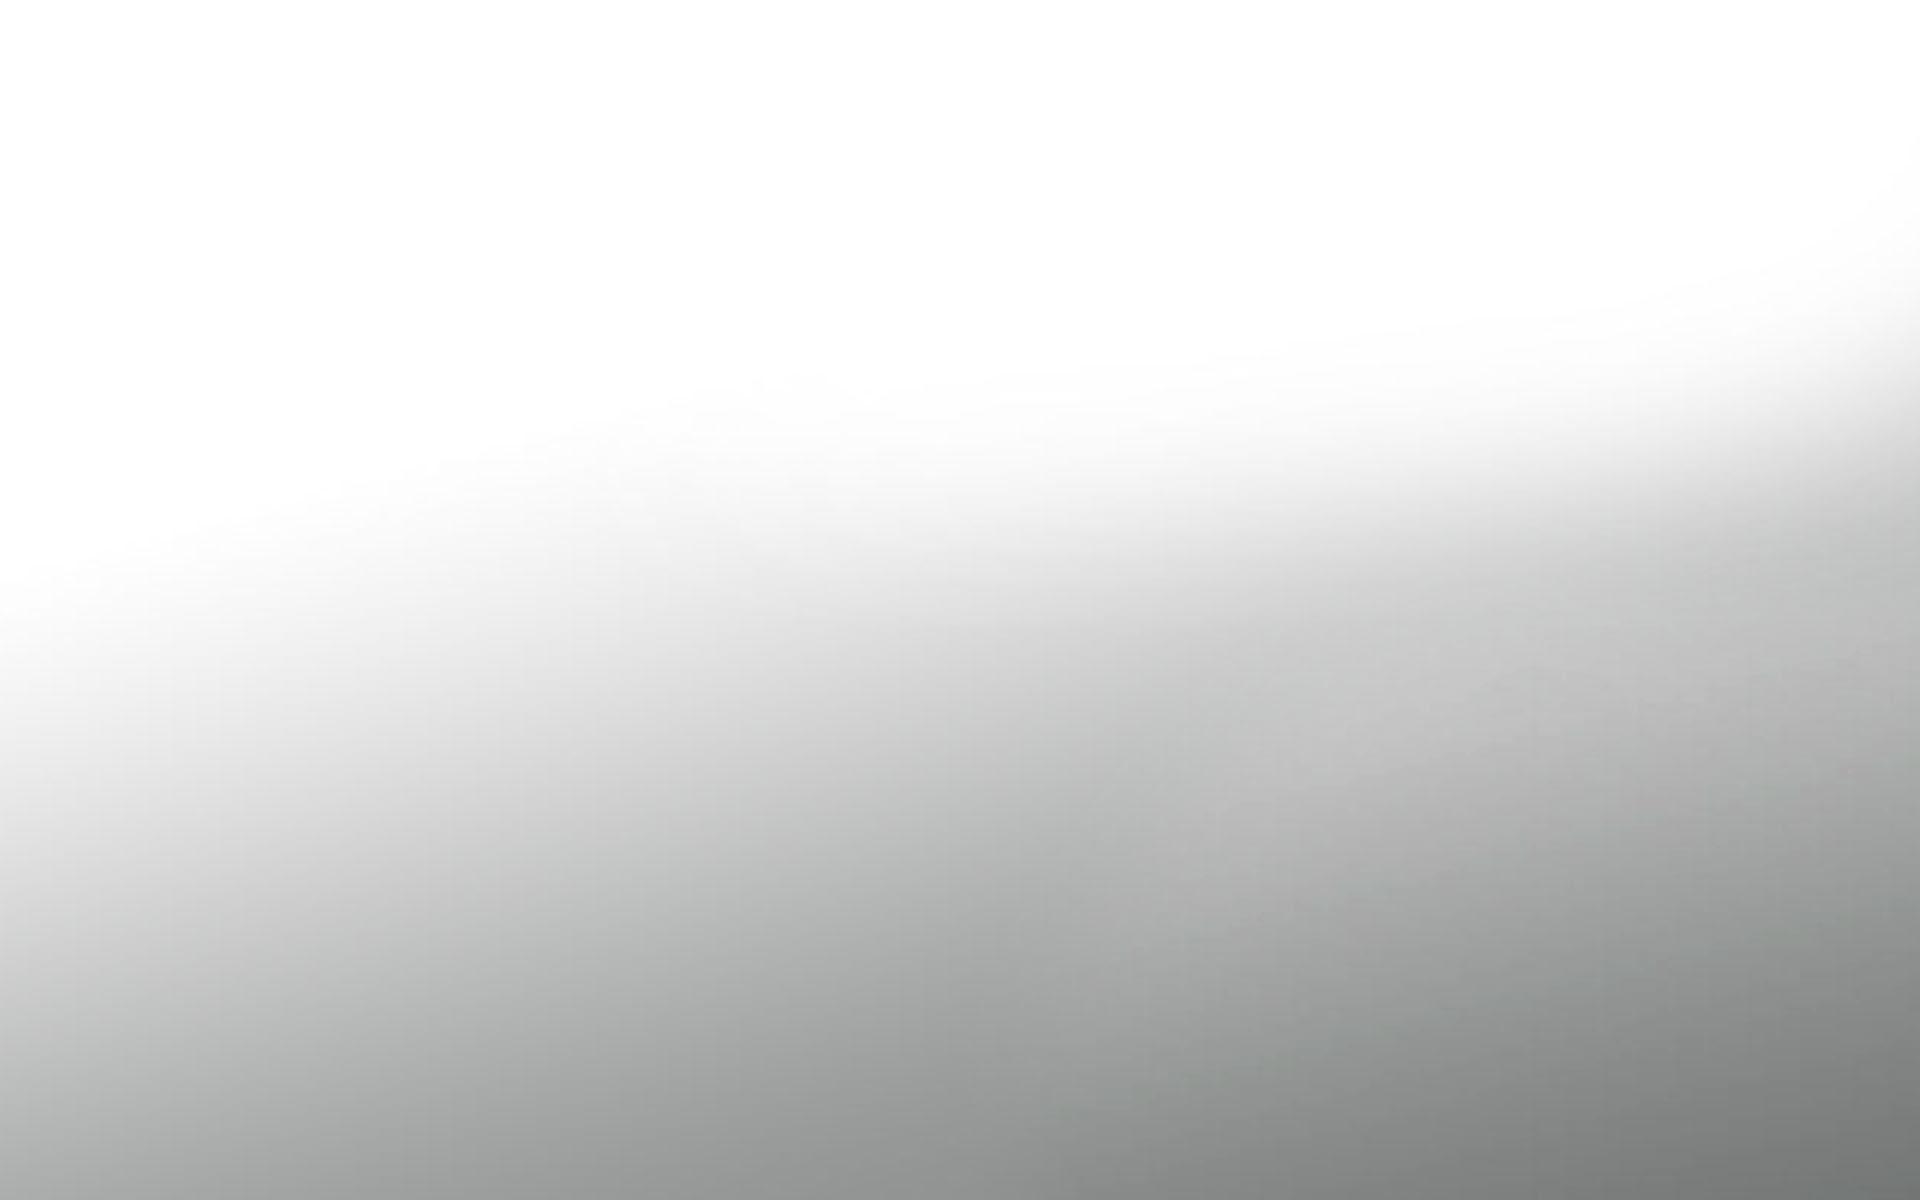 White Gradient Background Wallpaper